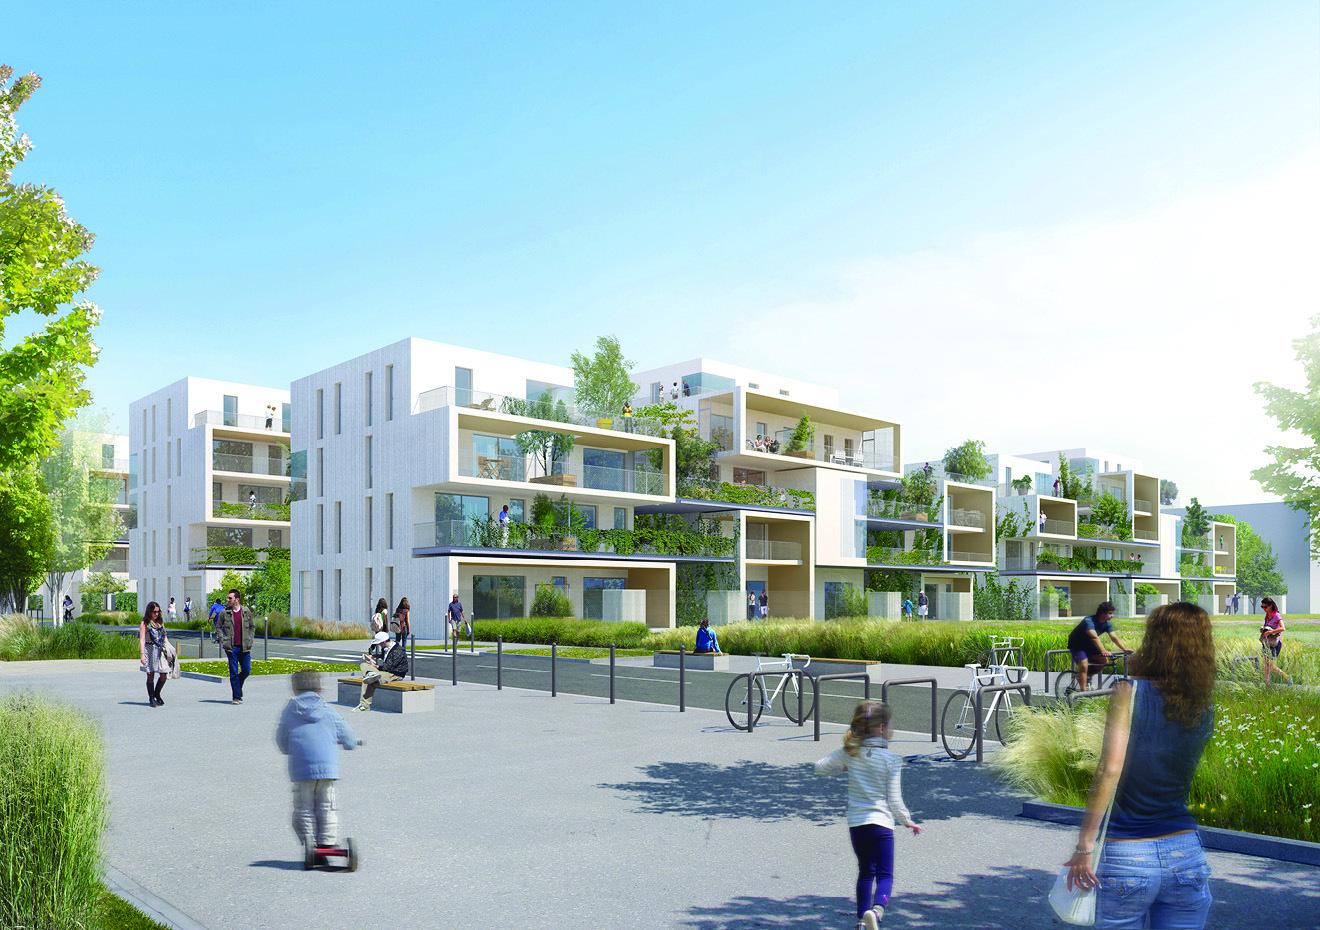 Programme immobilier garden village à villeurbanne biens neufs